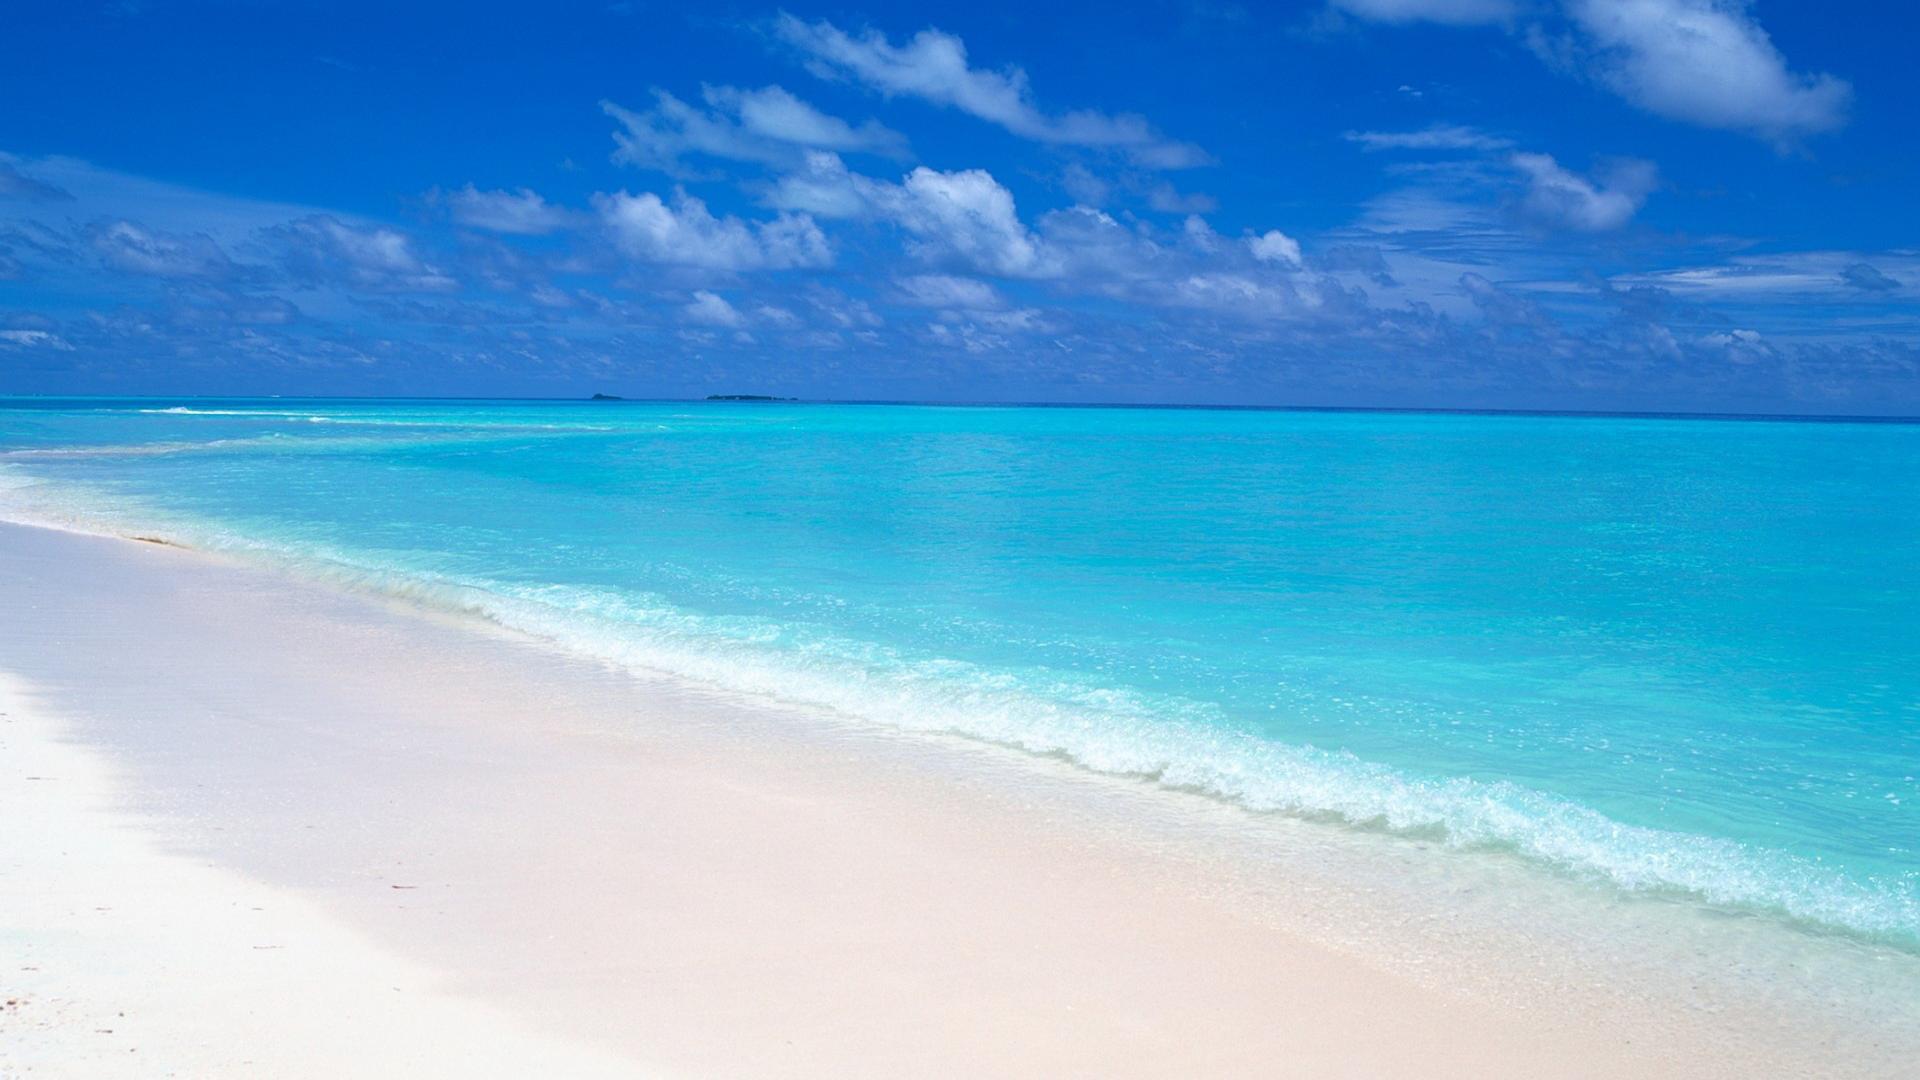 Maldives white beach HD Wallpapers 1920x1080 Beach Wallpapers 1920x1080